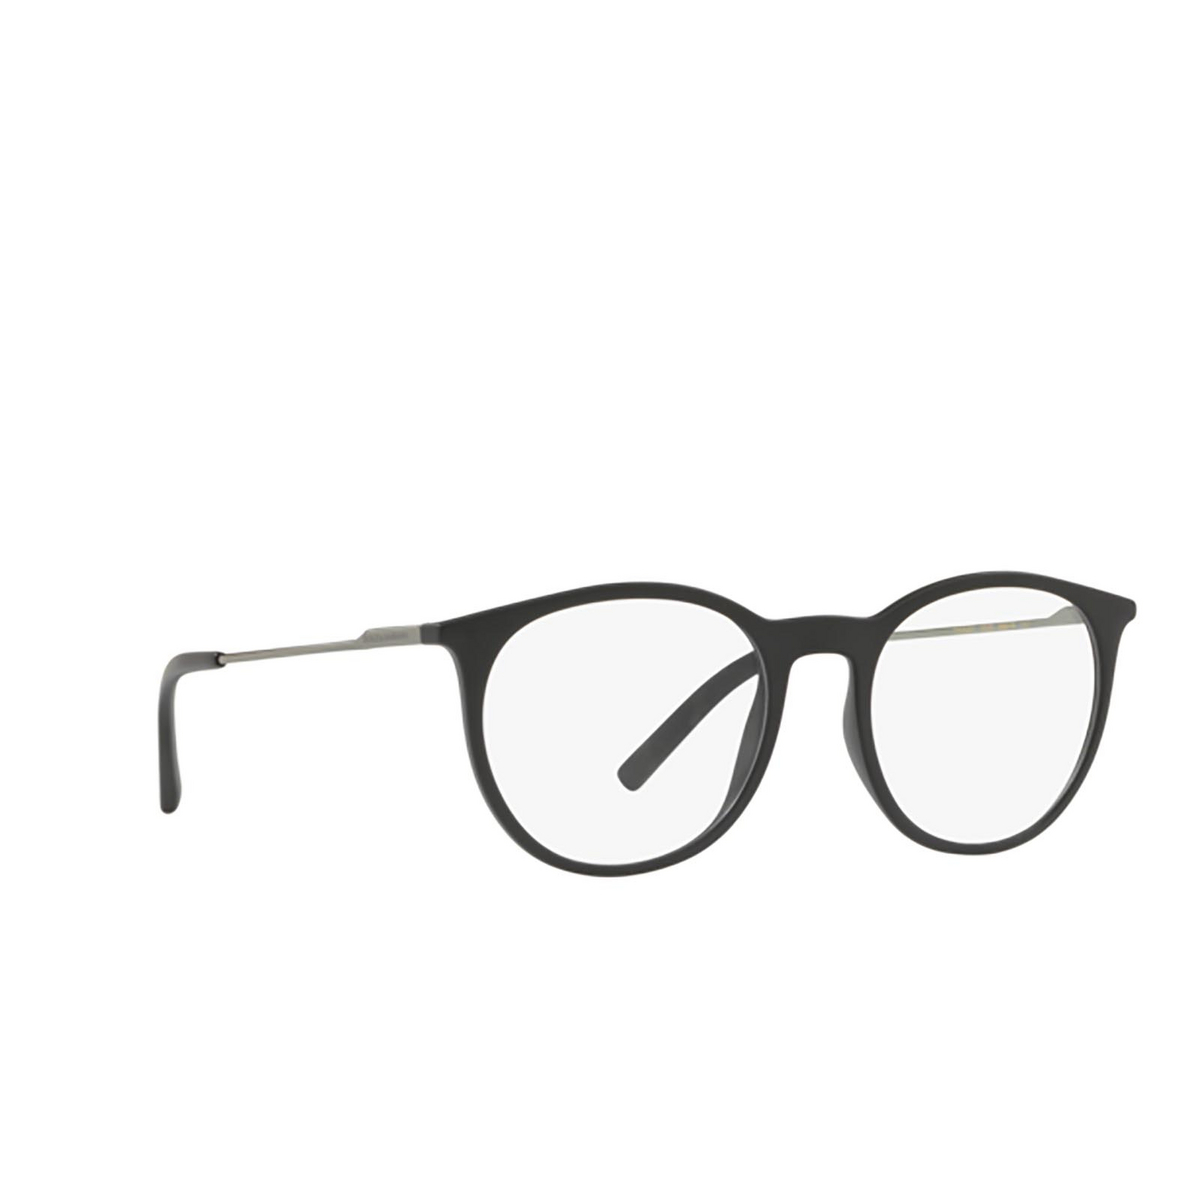 Dolce & Gabbana® Round Eyeglasses: DG5031 color Matte Black 2525 - three-quarters view.